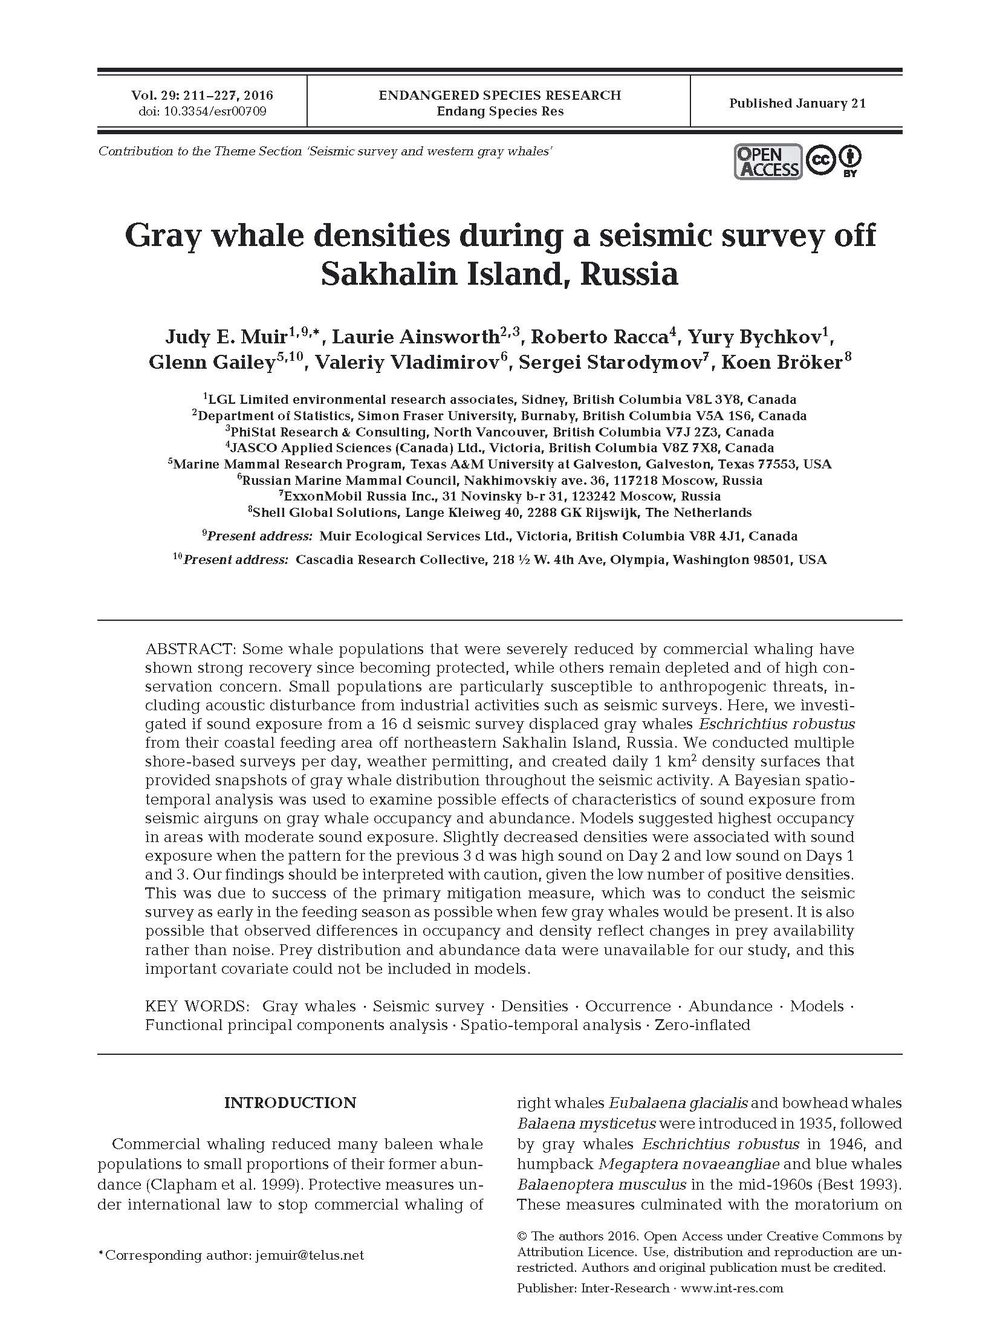 - Muir, J.E., L. Ainsworth, R. Racca, Y. Bychkov, G. Gailey, V. Vladimirov, S. Starodymov, and K. Bröker. 2016. Gray whale densities during a seismic survey off Sakhalin Island, Russia. Endang.Species Res. 29: 211-227.http://www.int-res.com/articles/esr2016/29/n029p211.pdf